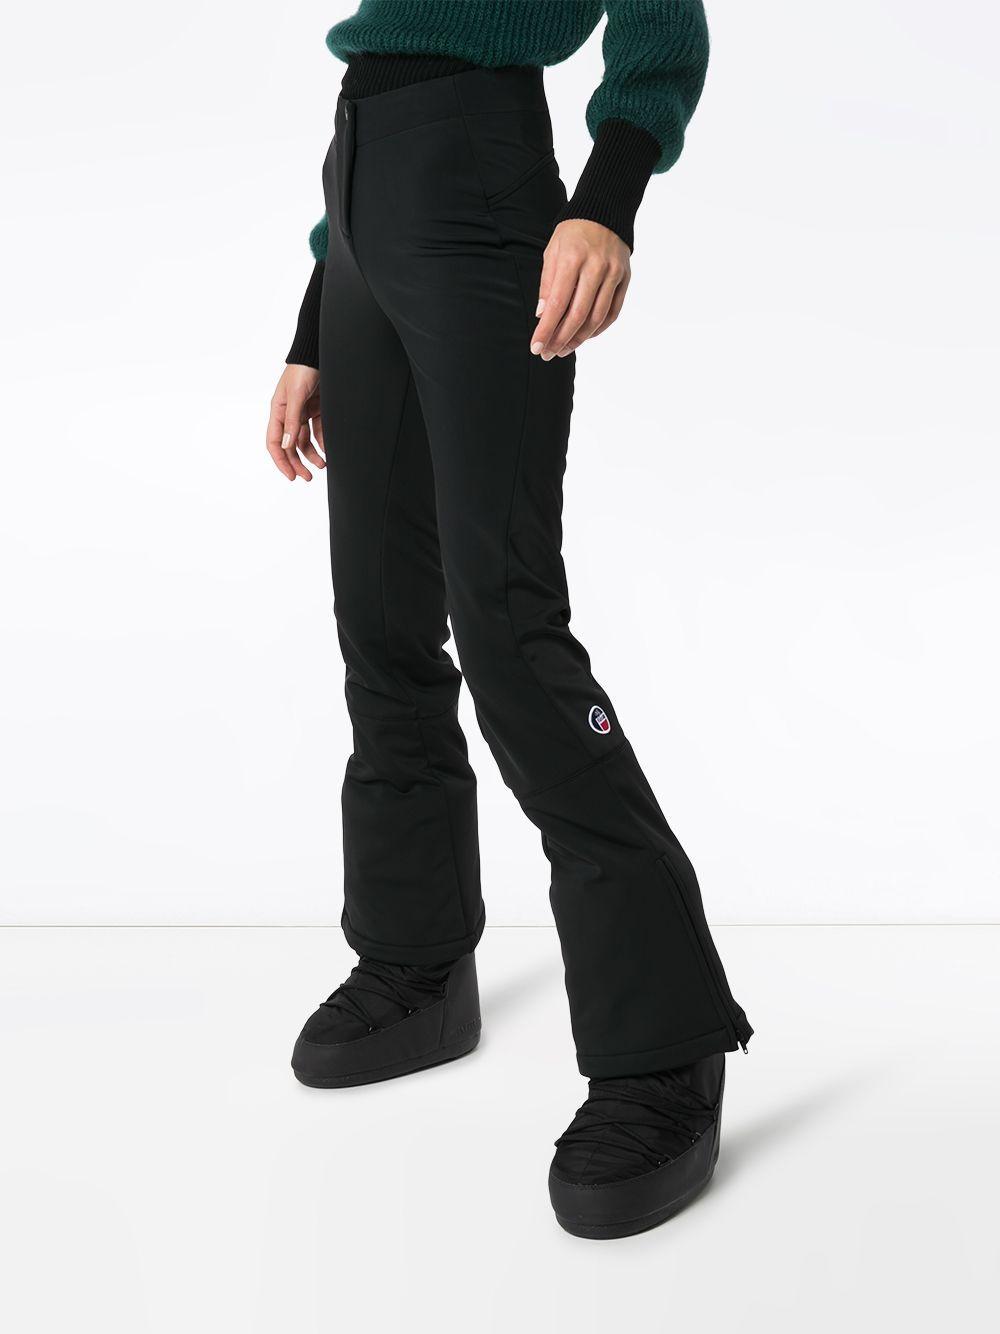 Pantalones de esquí Tipi Fusalp de Tejido sintético de color Negro